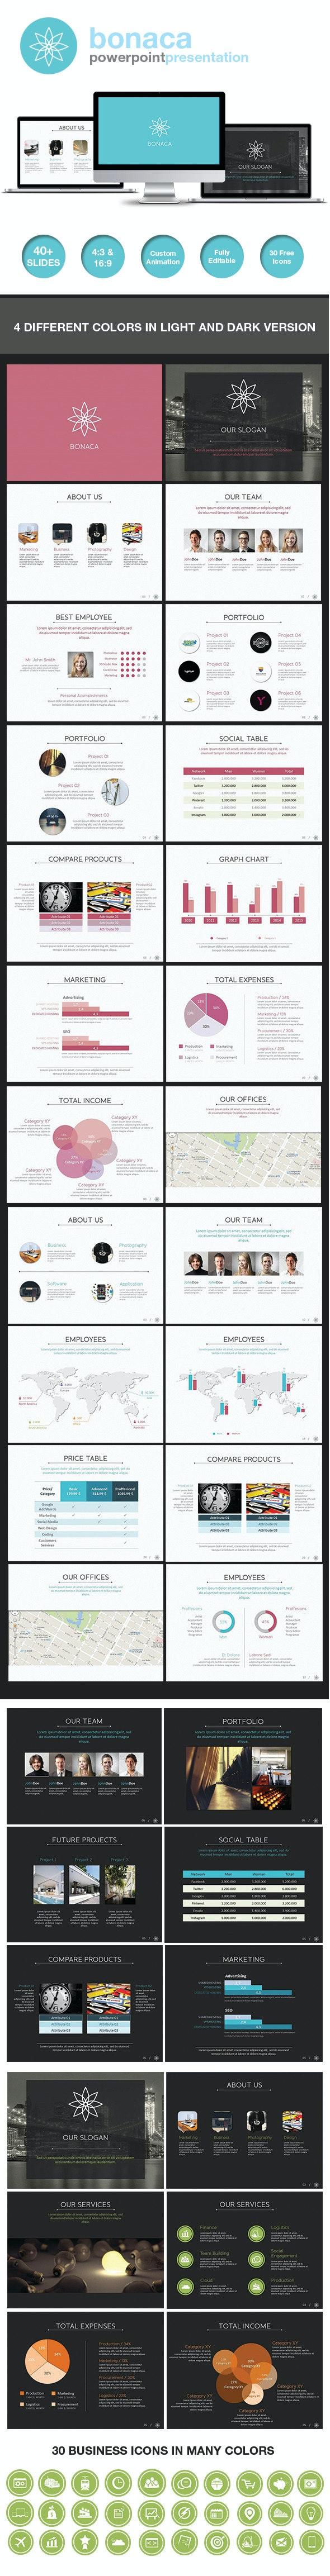 Bonaca Powerpoint Presentation - Business PowerPoint Templates